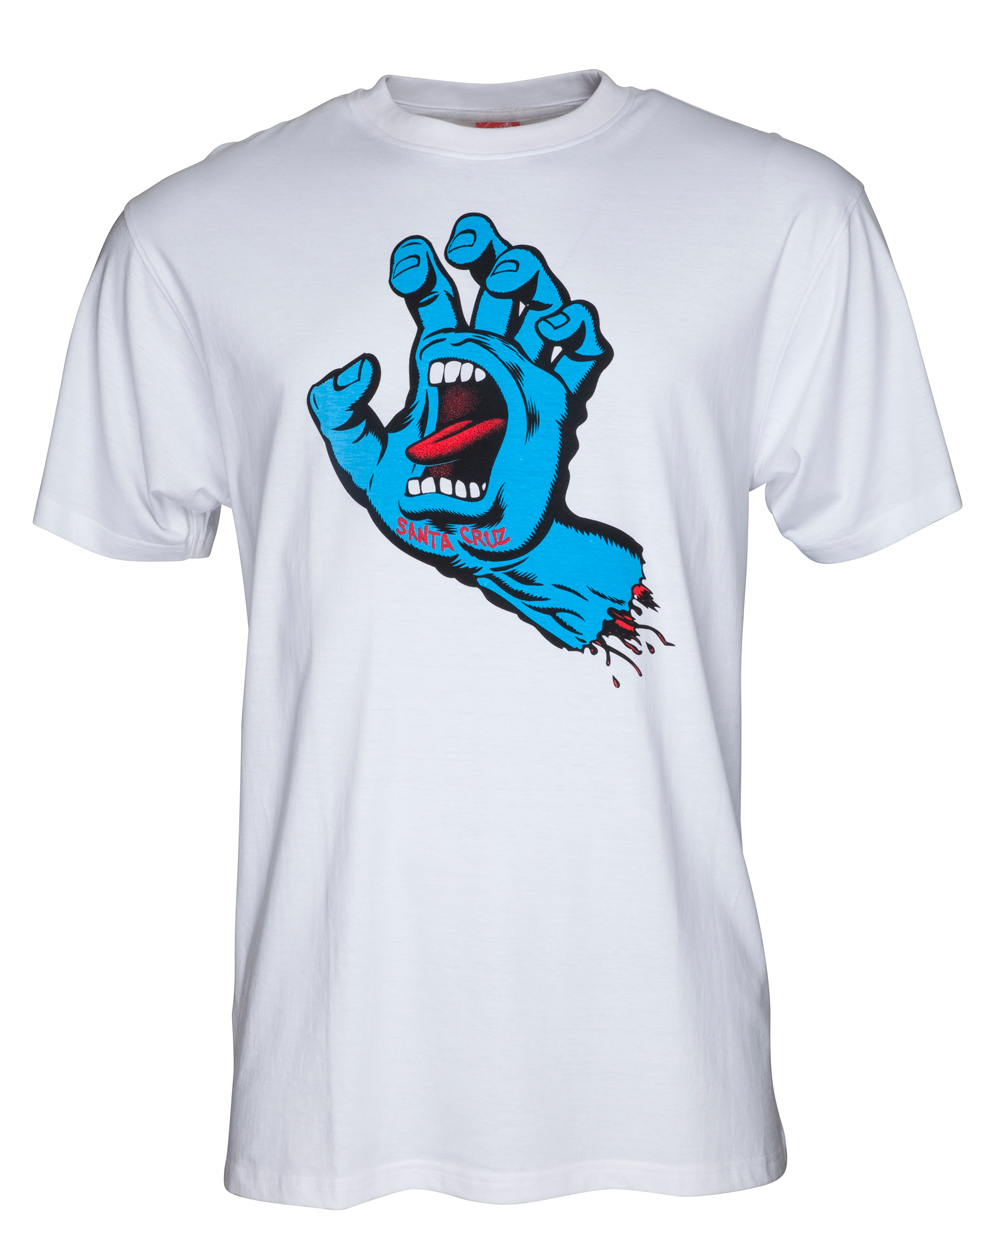 Santa Cruz Men's T-Shirt Screaming Hand White